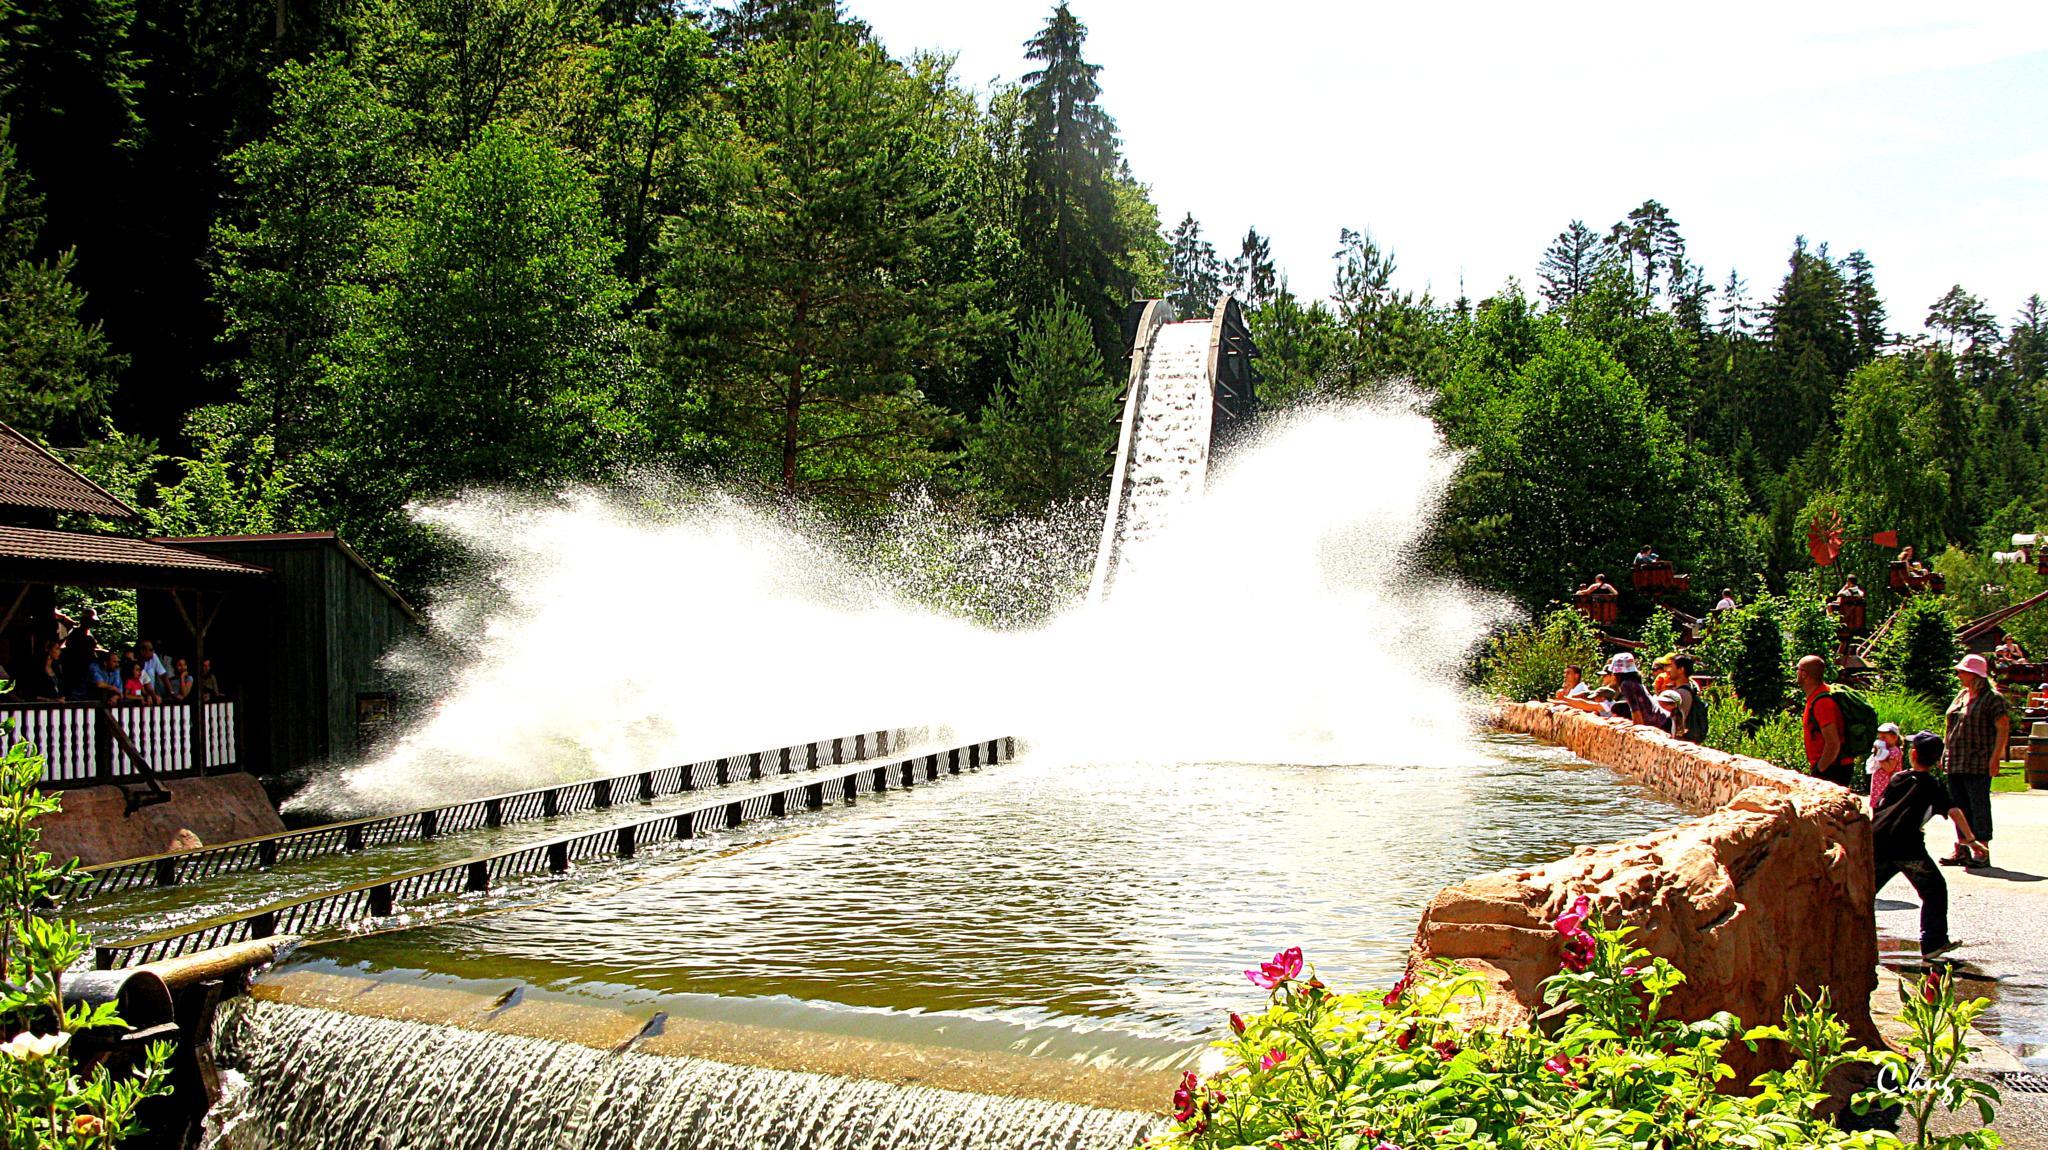 Parc d'attraction by Huguenin Claude